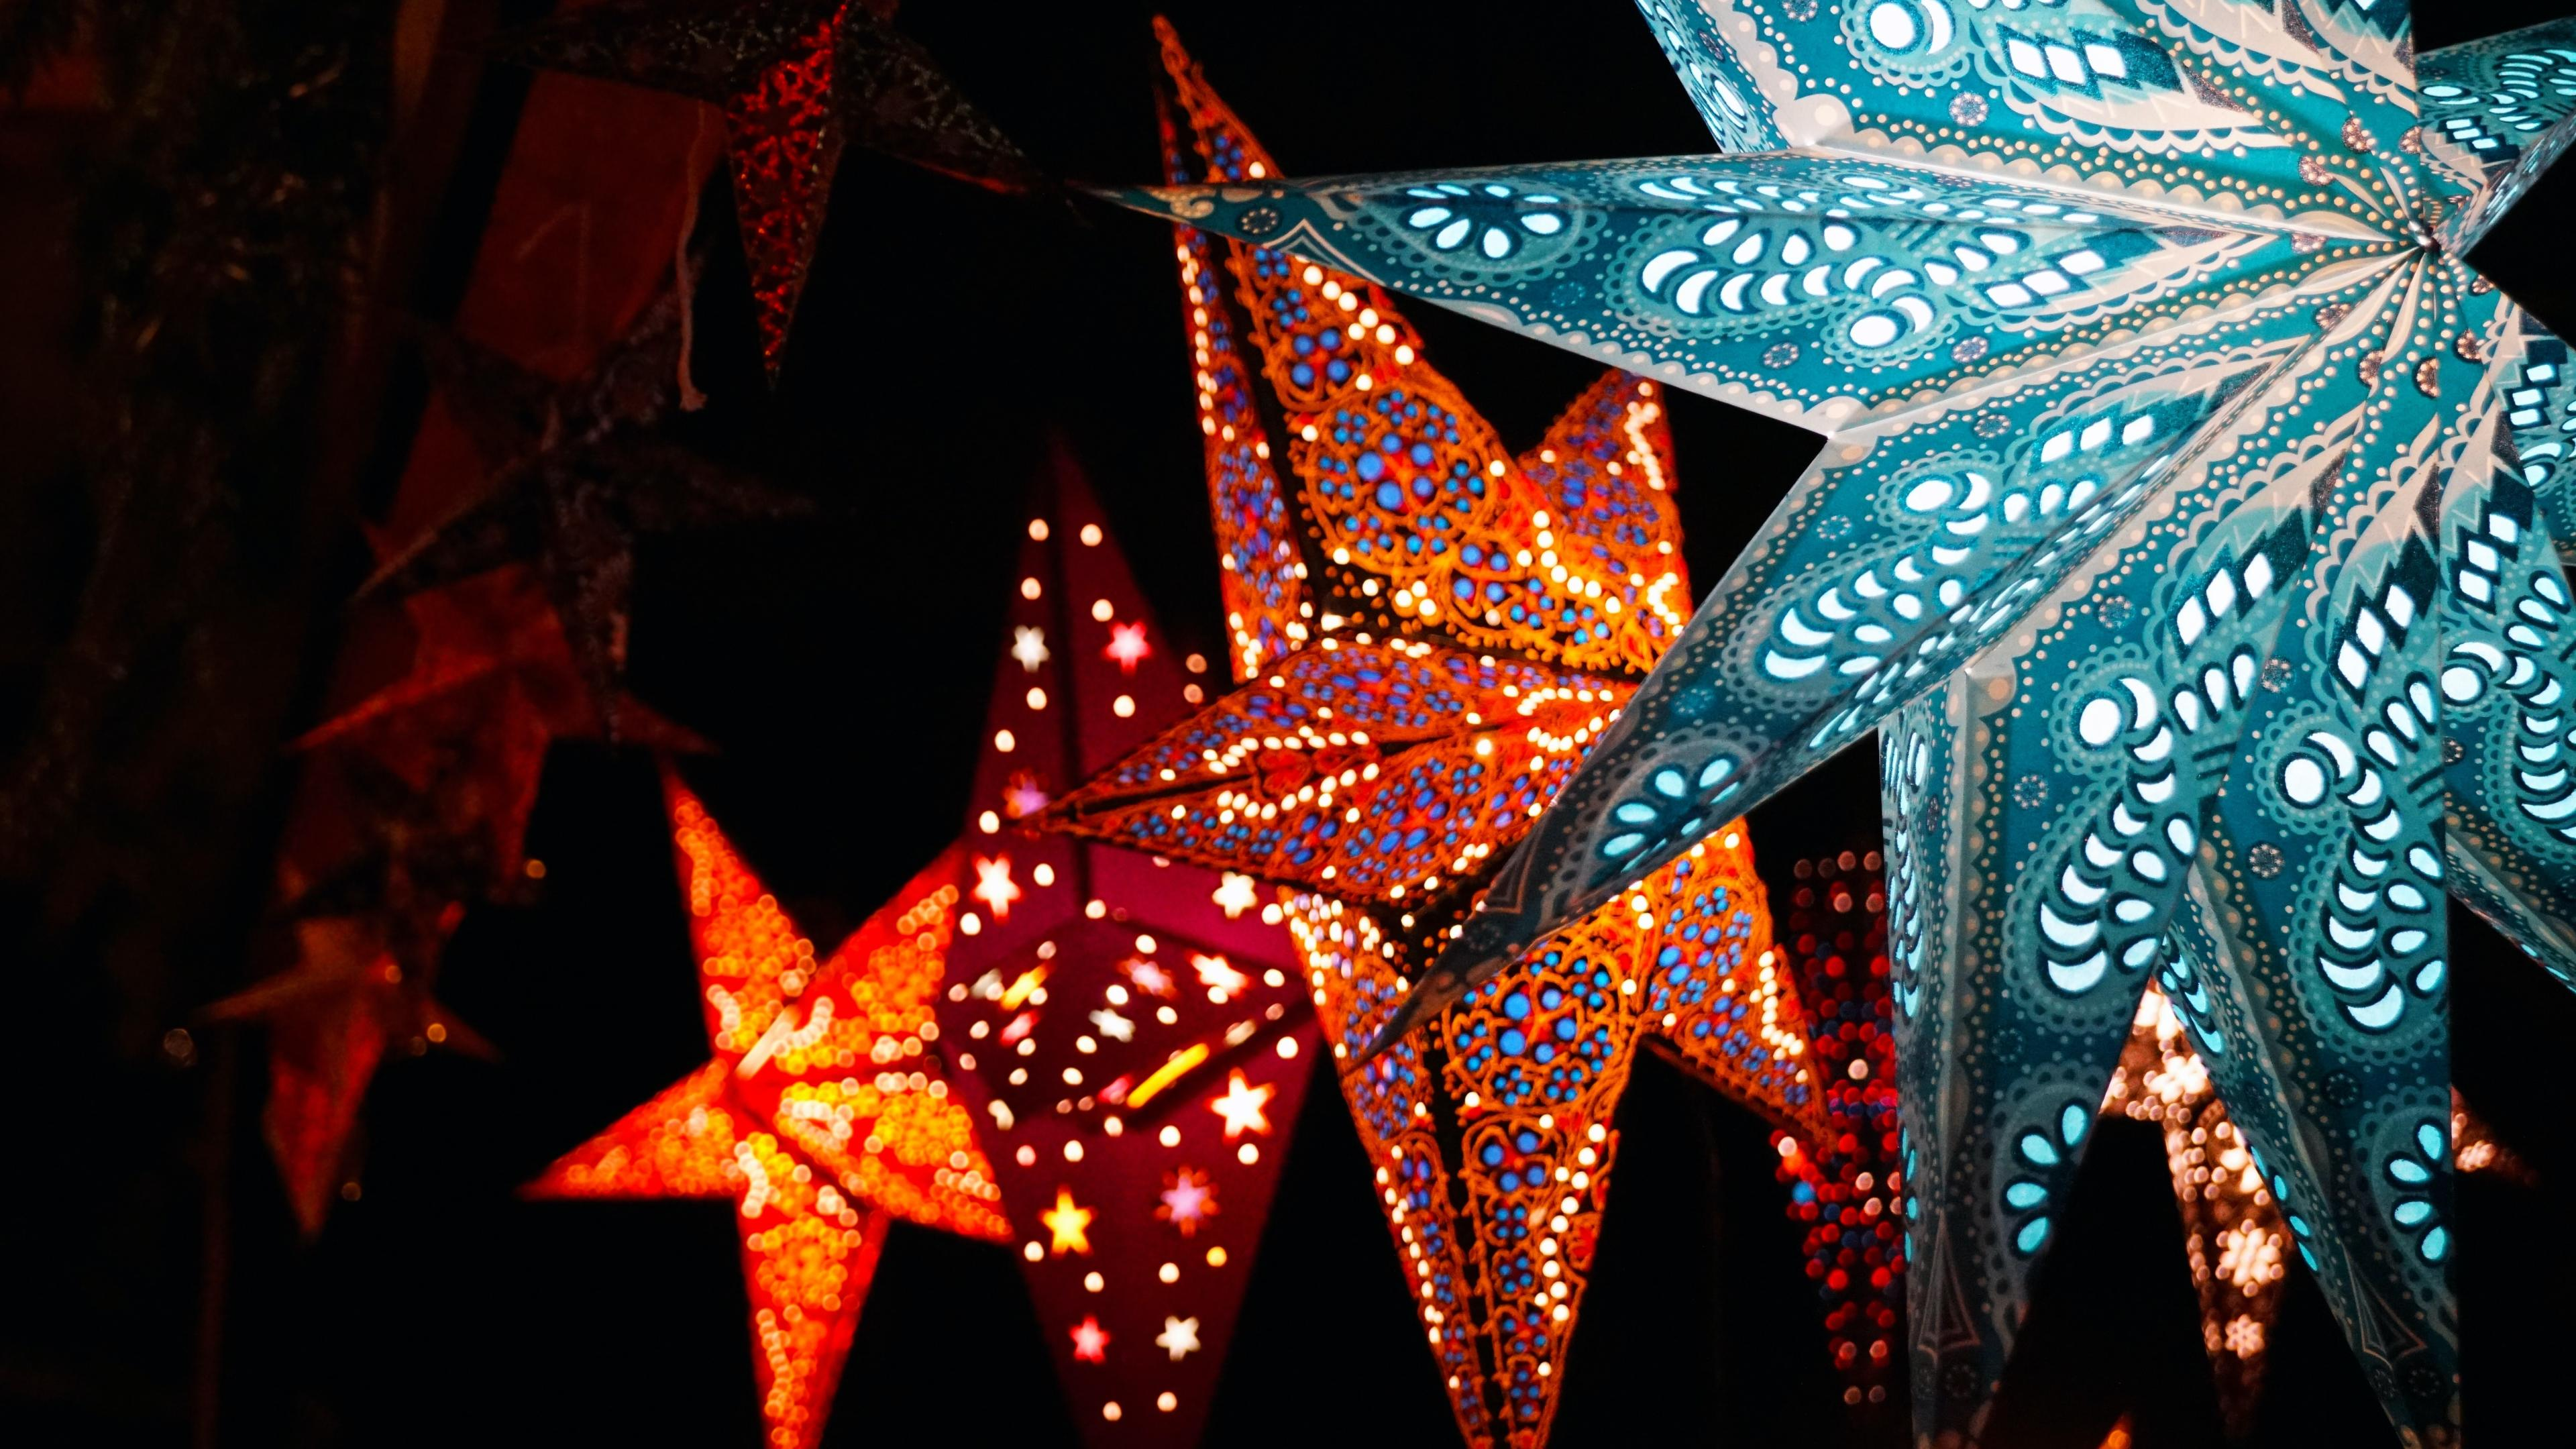 Star-shaped paper lanterns